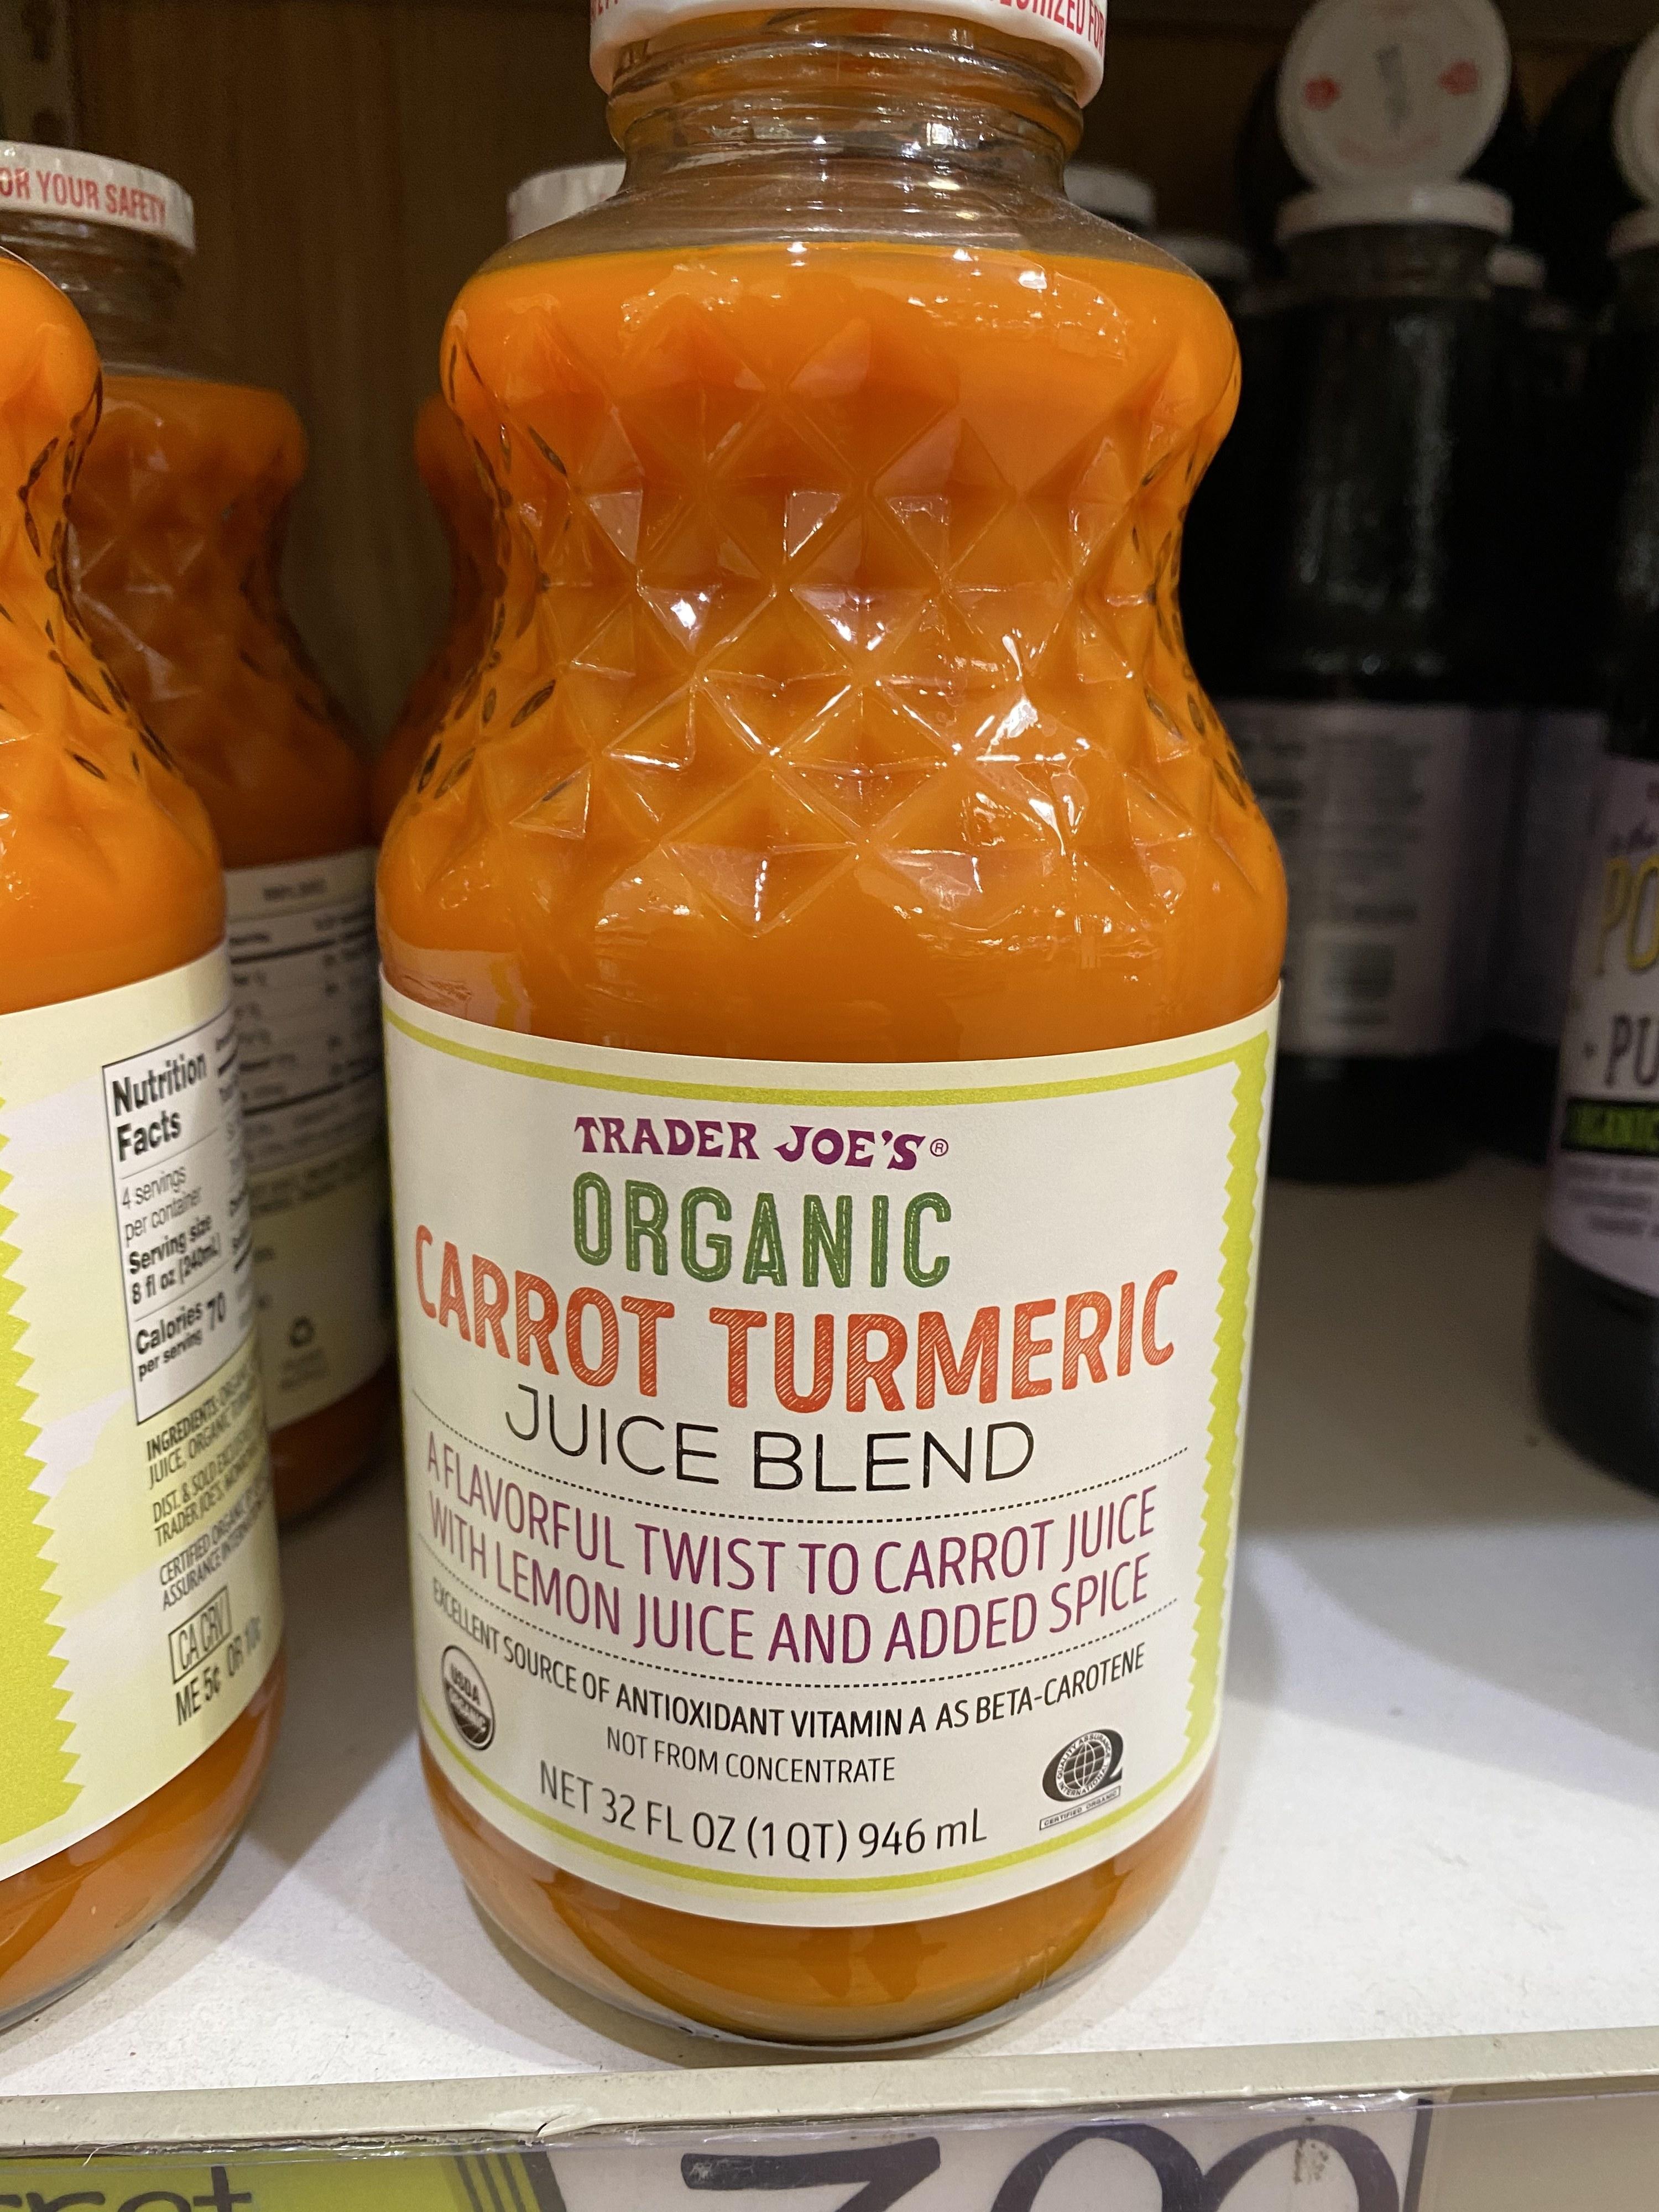 Carrot turmeric juice blend from Trader Joe's.